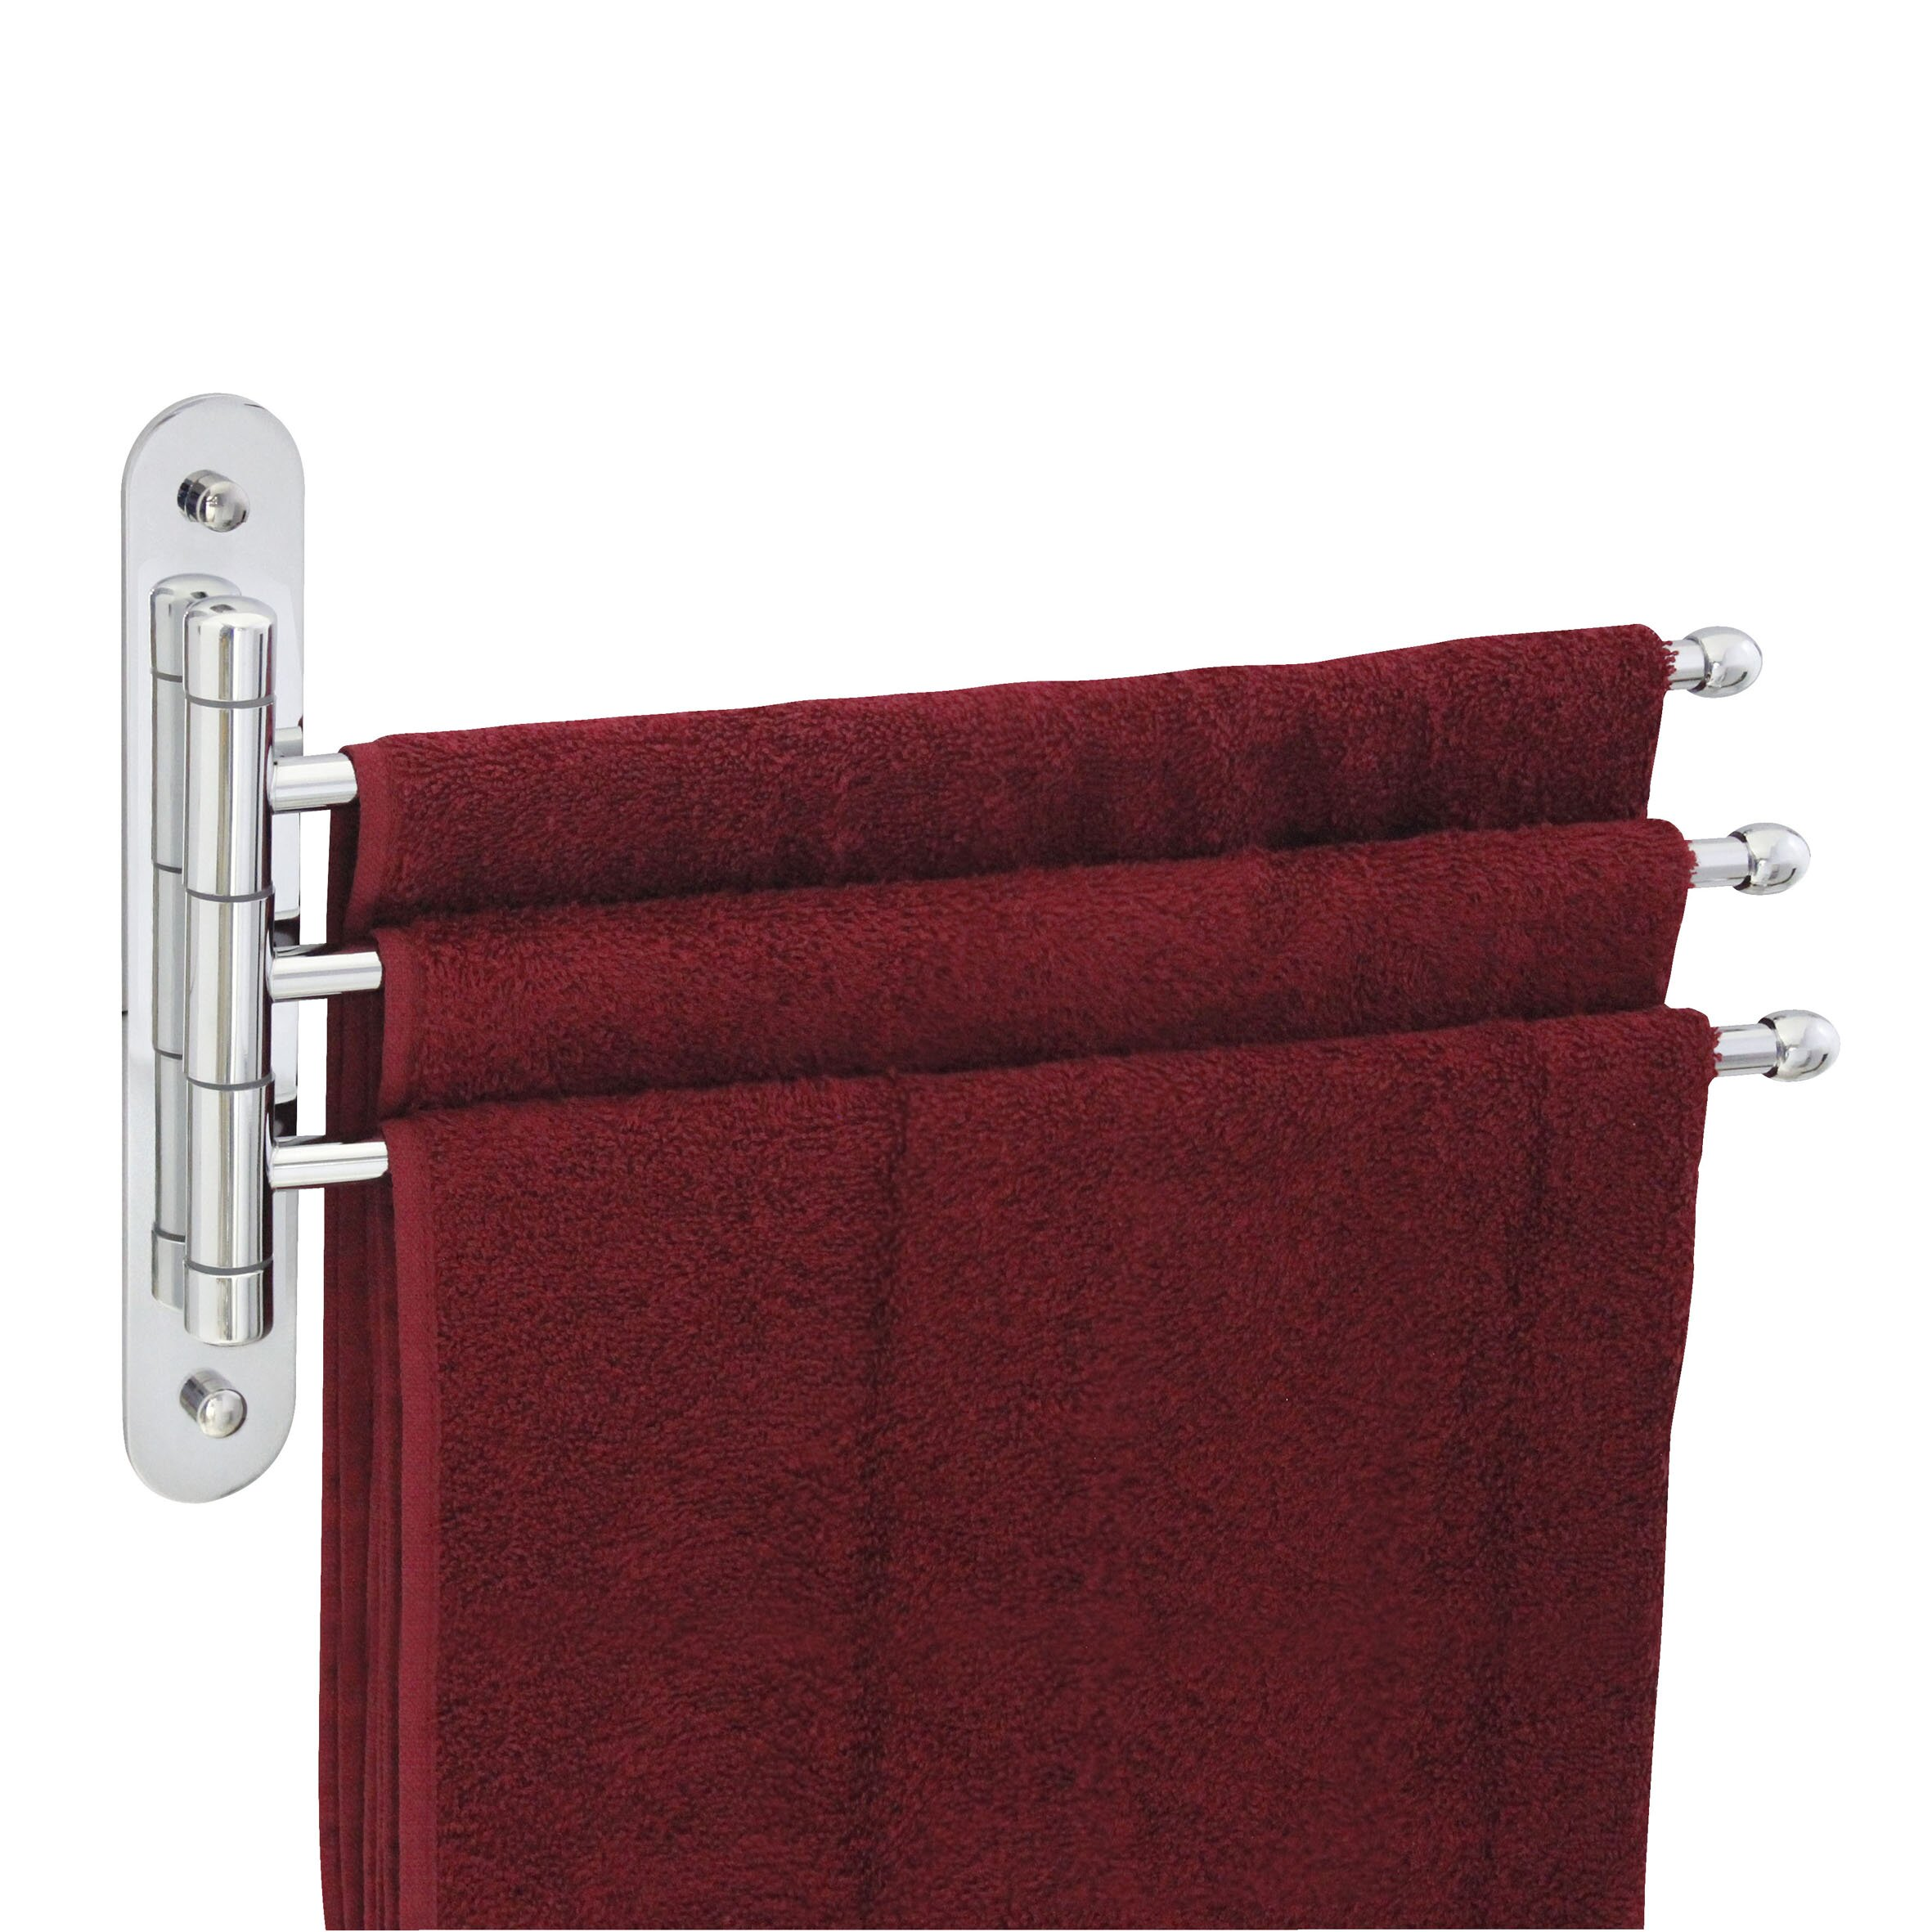 "Modona Triple Swing 15"" Wall Mounted Towel Bar"